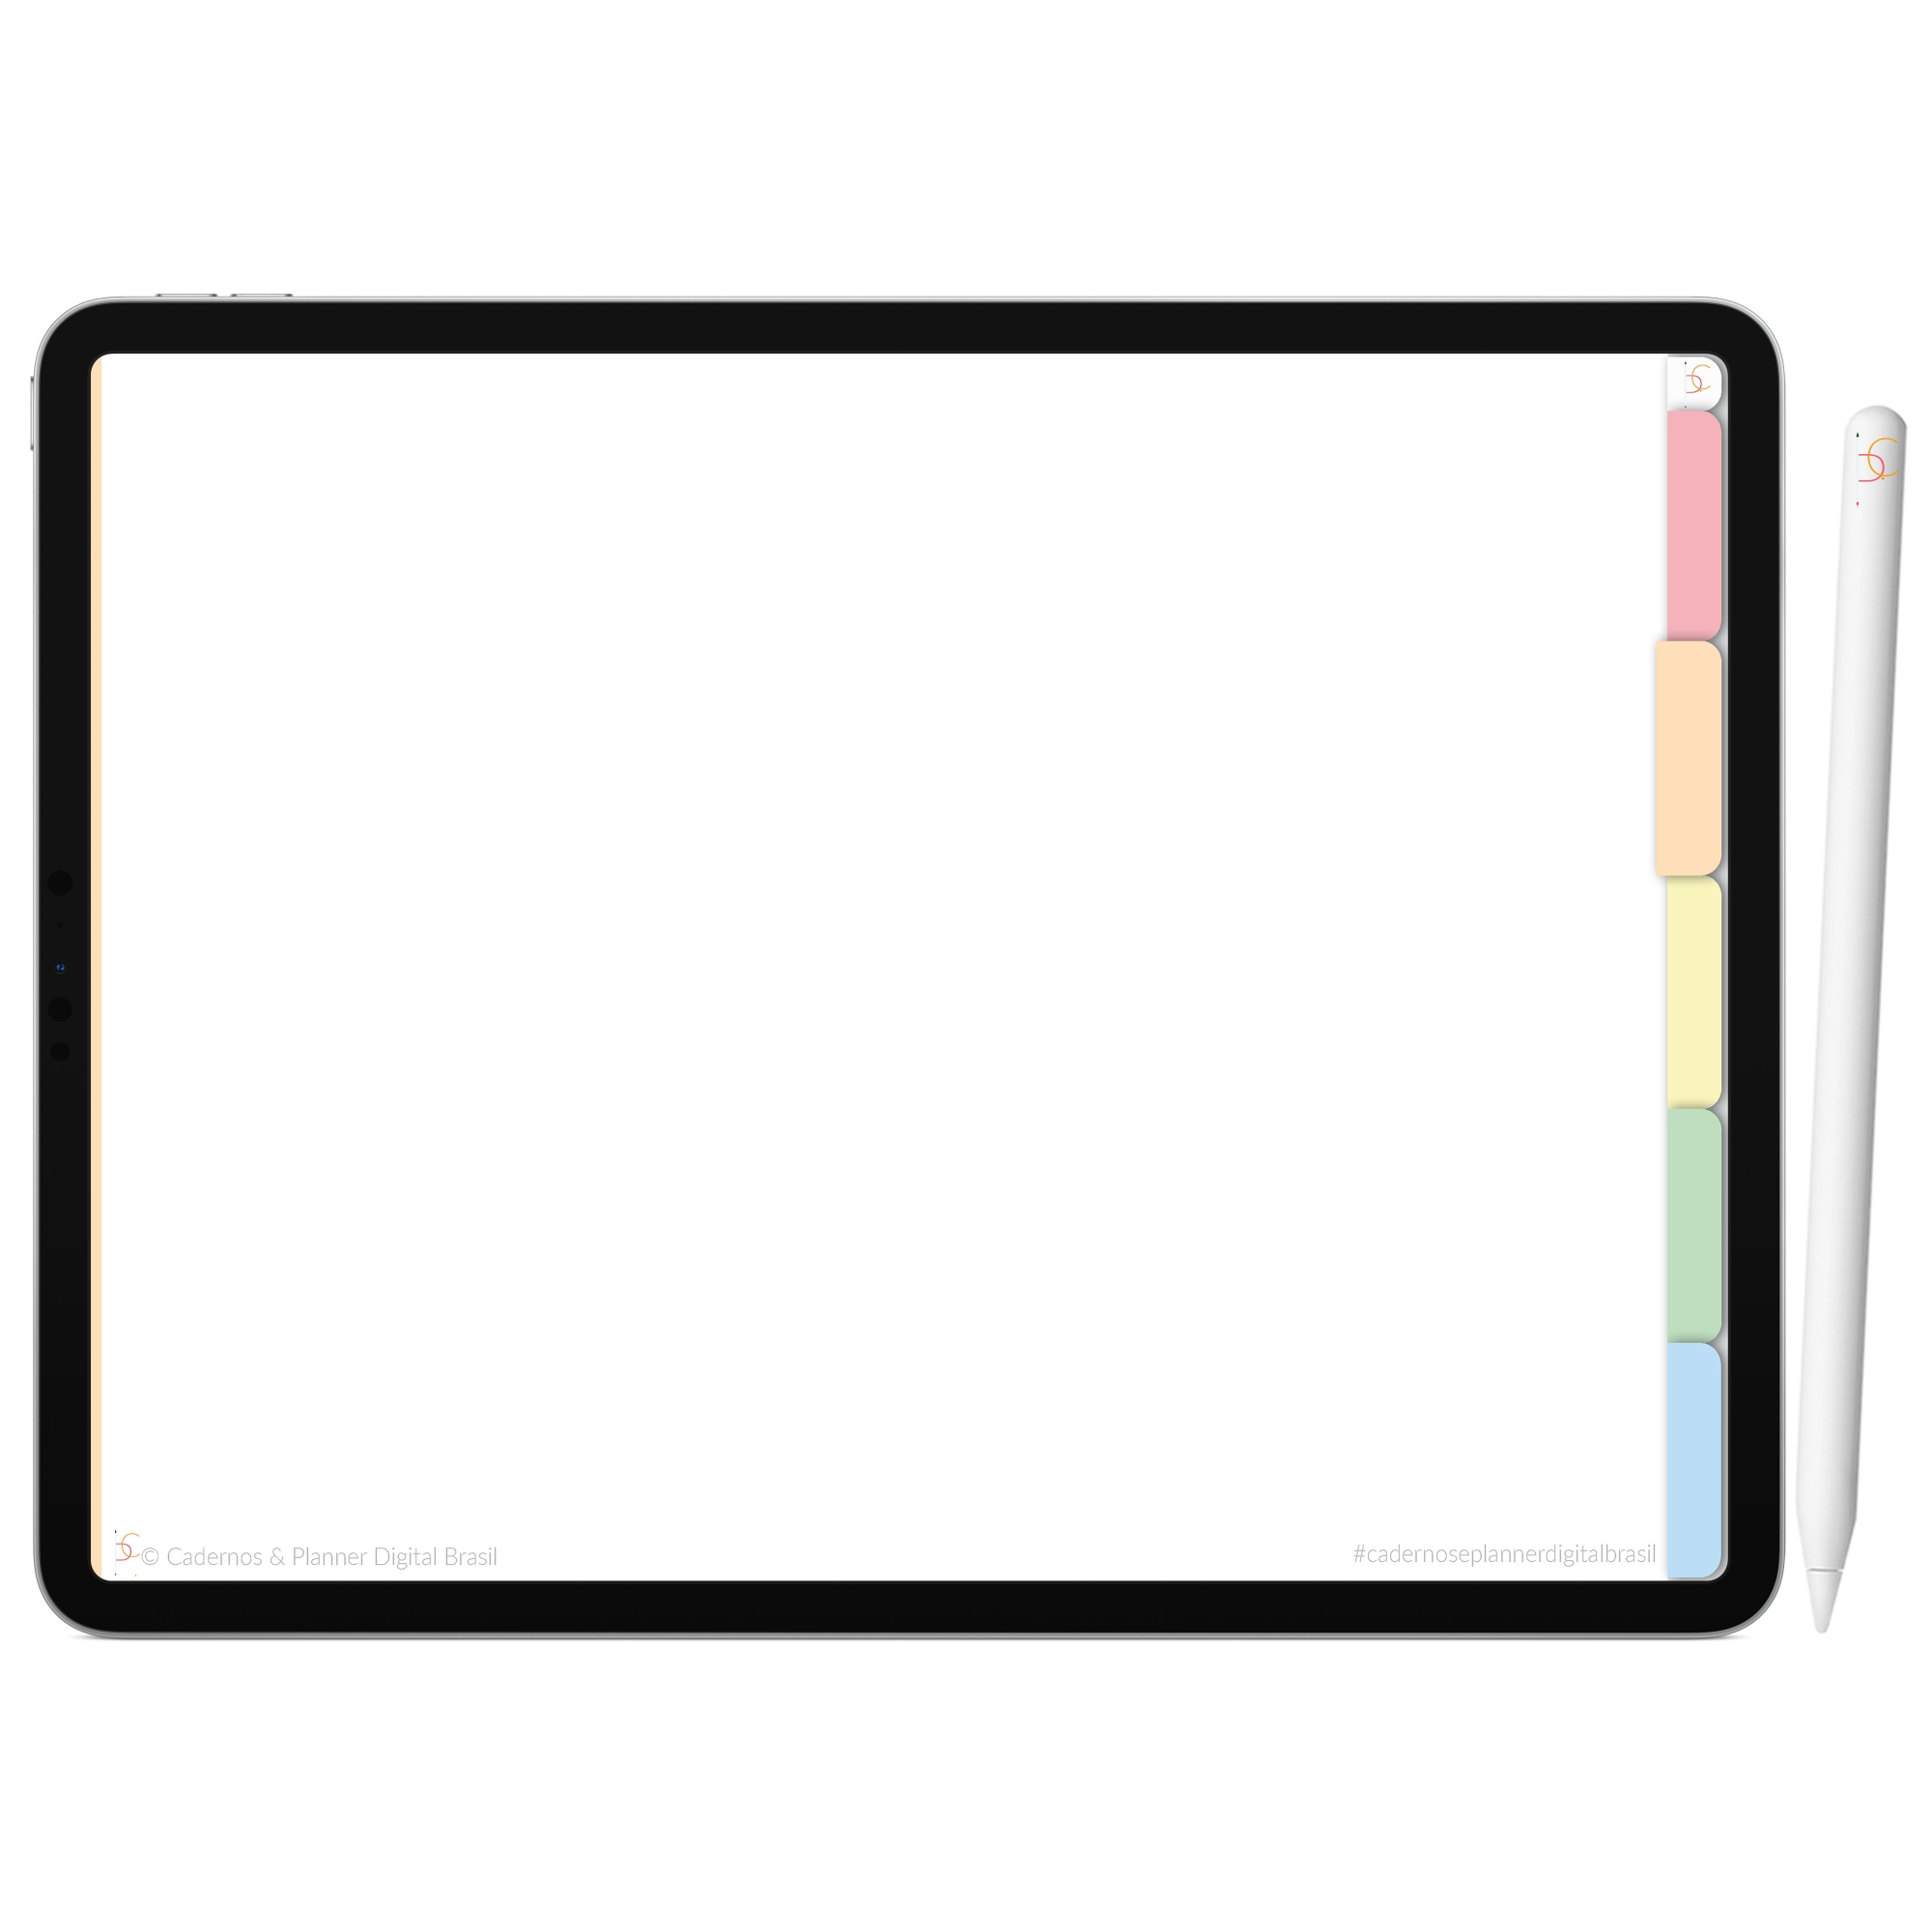 Mapa Mental Digital Rosa Arco-Íris | Cinco Matérias Interativo| iPad Tablet | Download Instantâneo